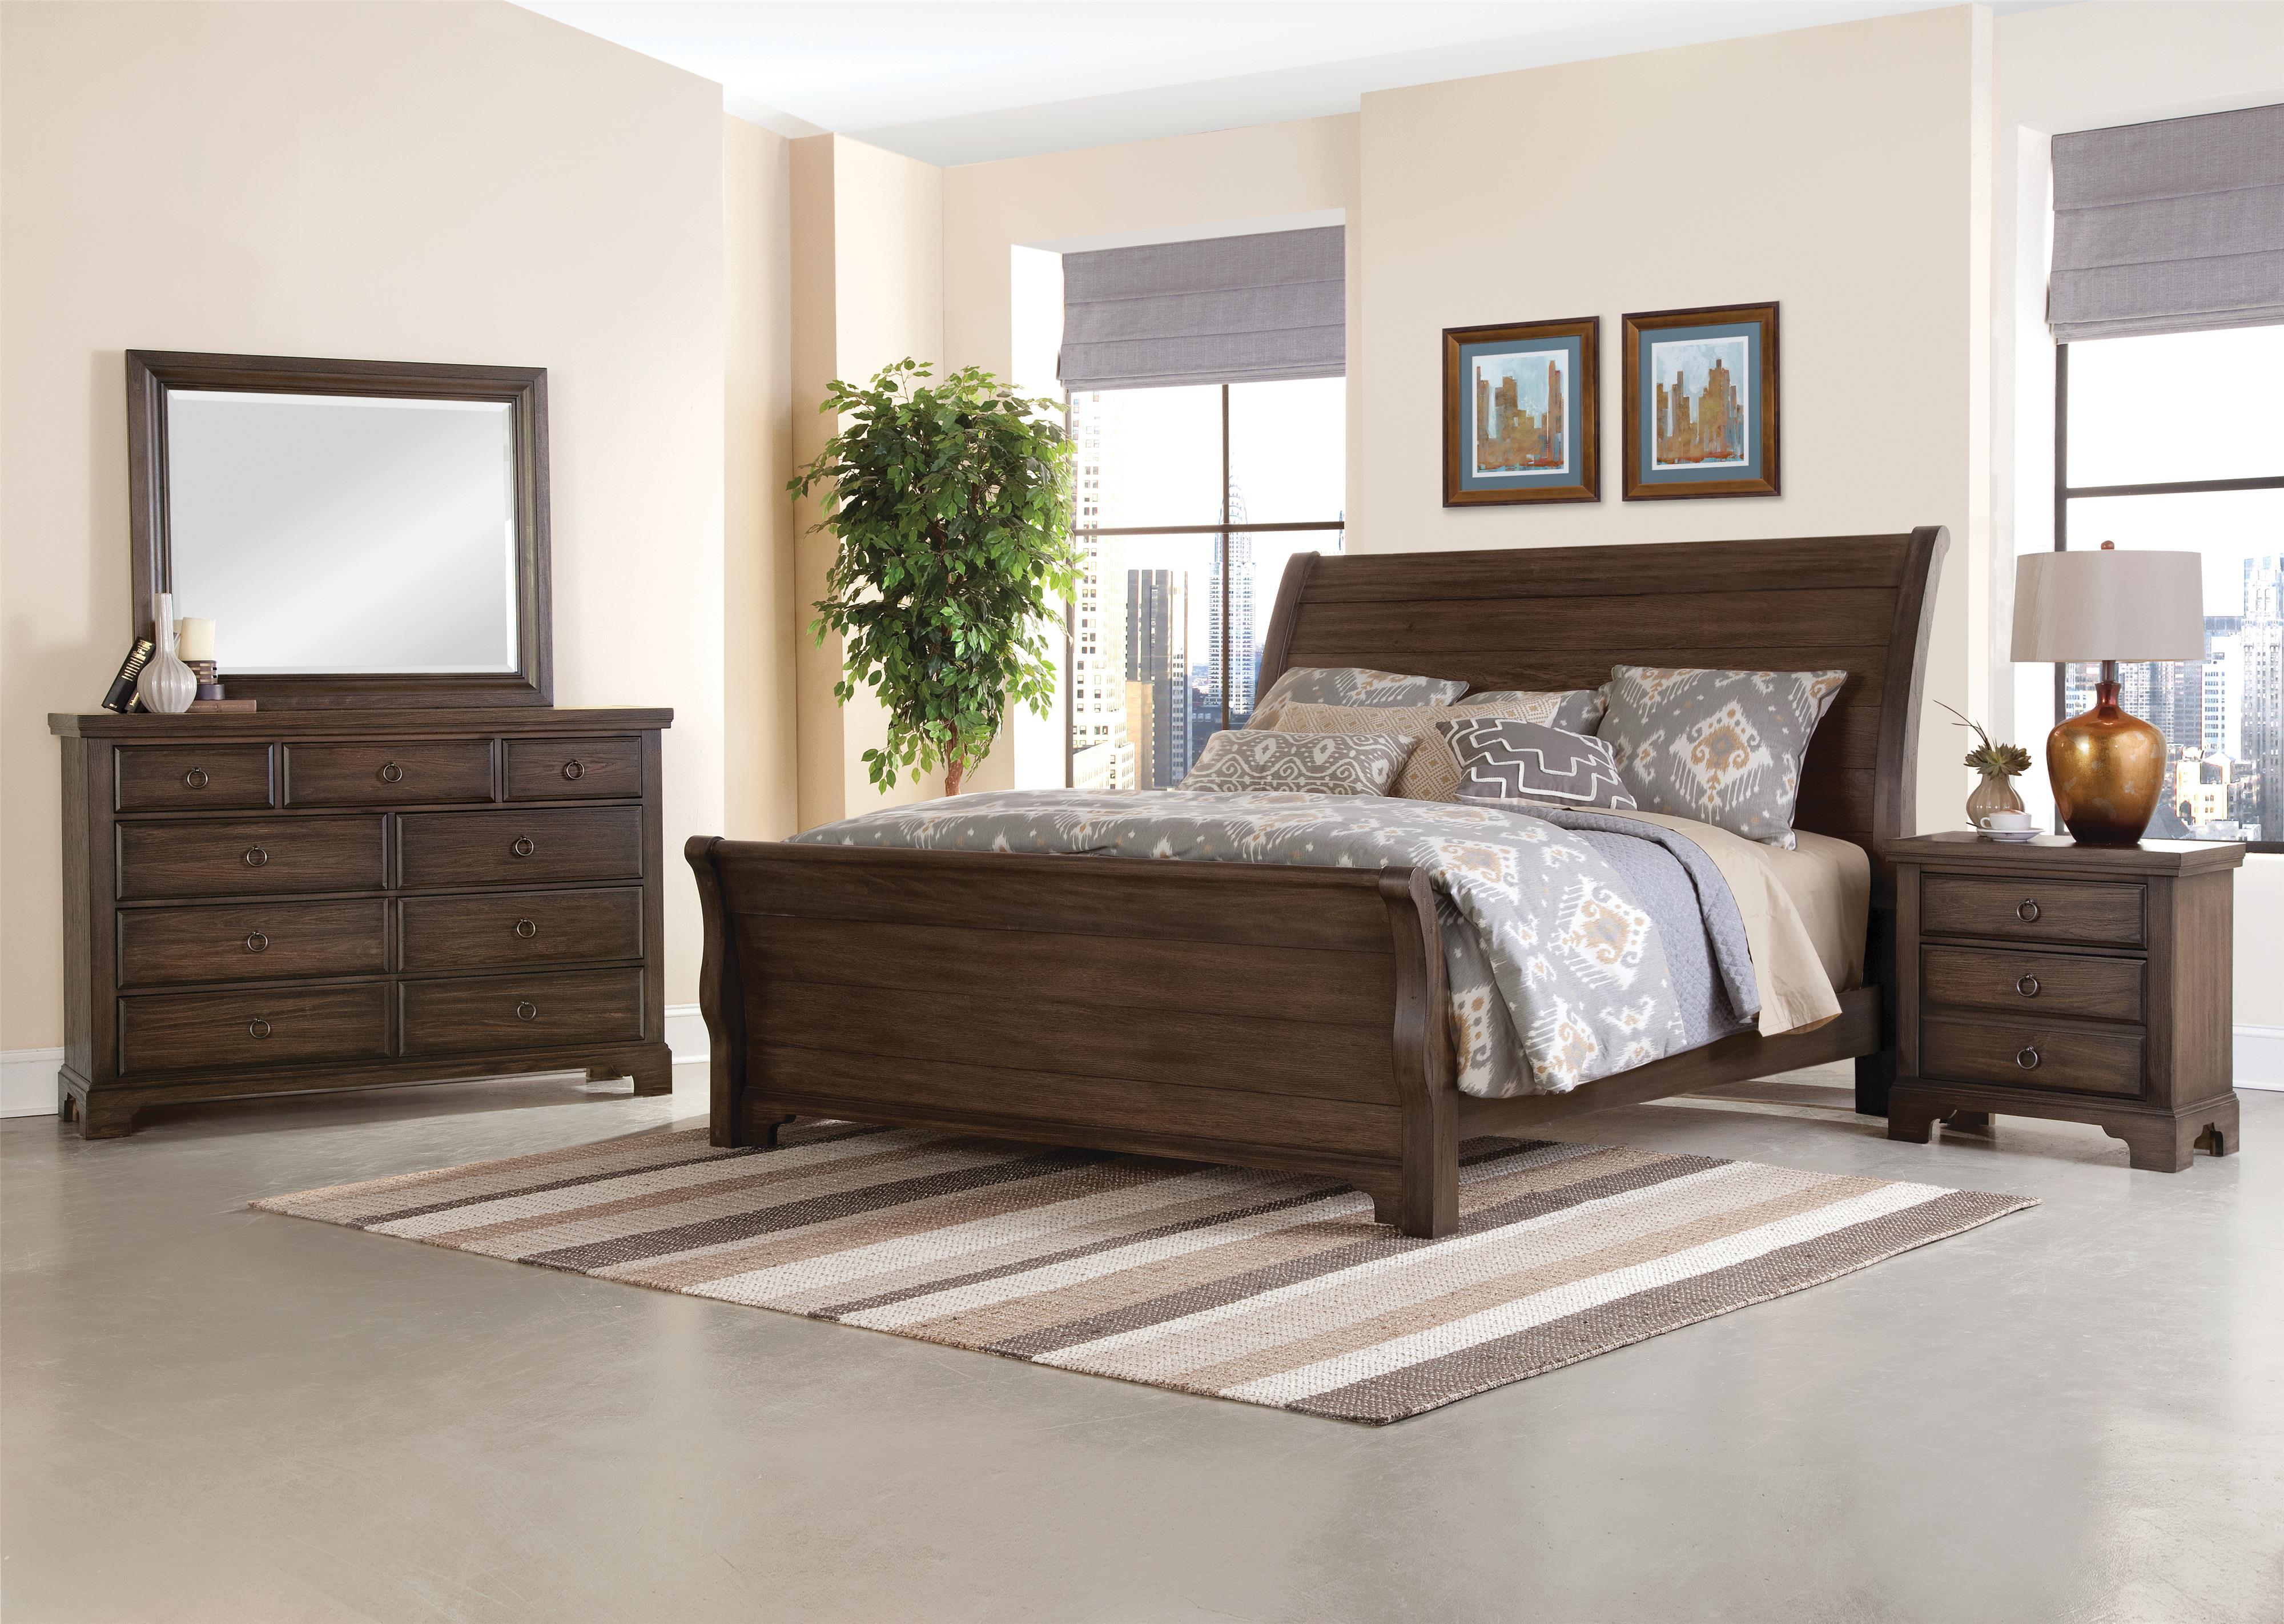 vaughan bassett whiskey barrel 816 003 distressed finish chesser 9 drawers becker furniture. Black Bedroom Furniture Sets. Home Design Ideas